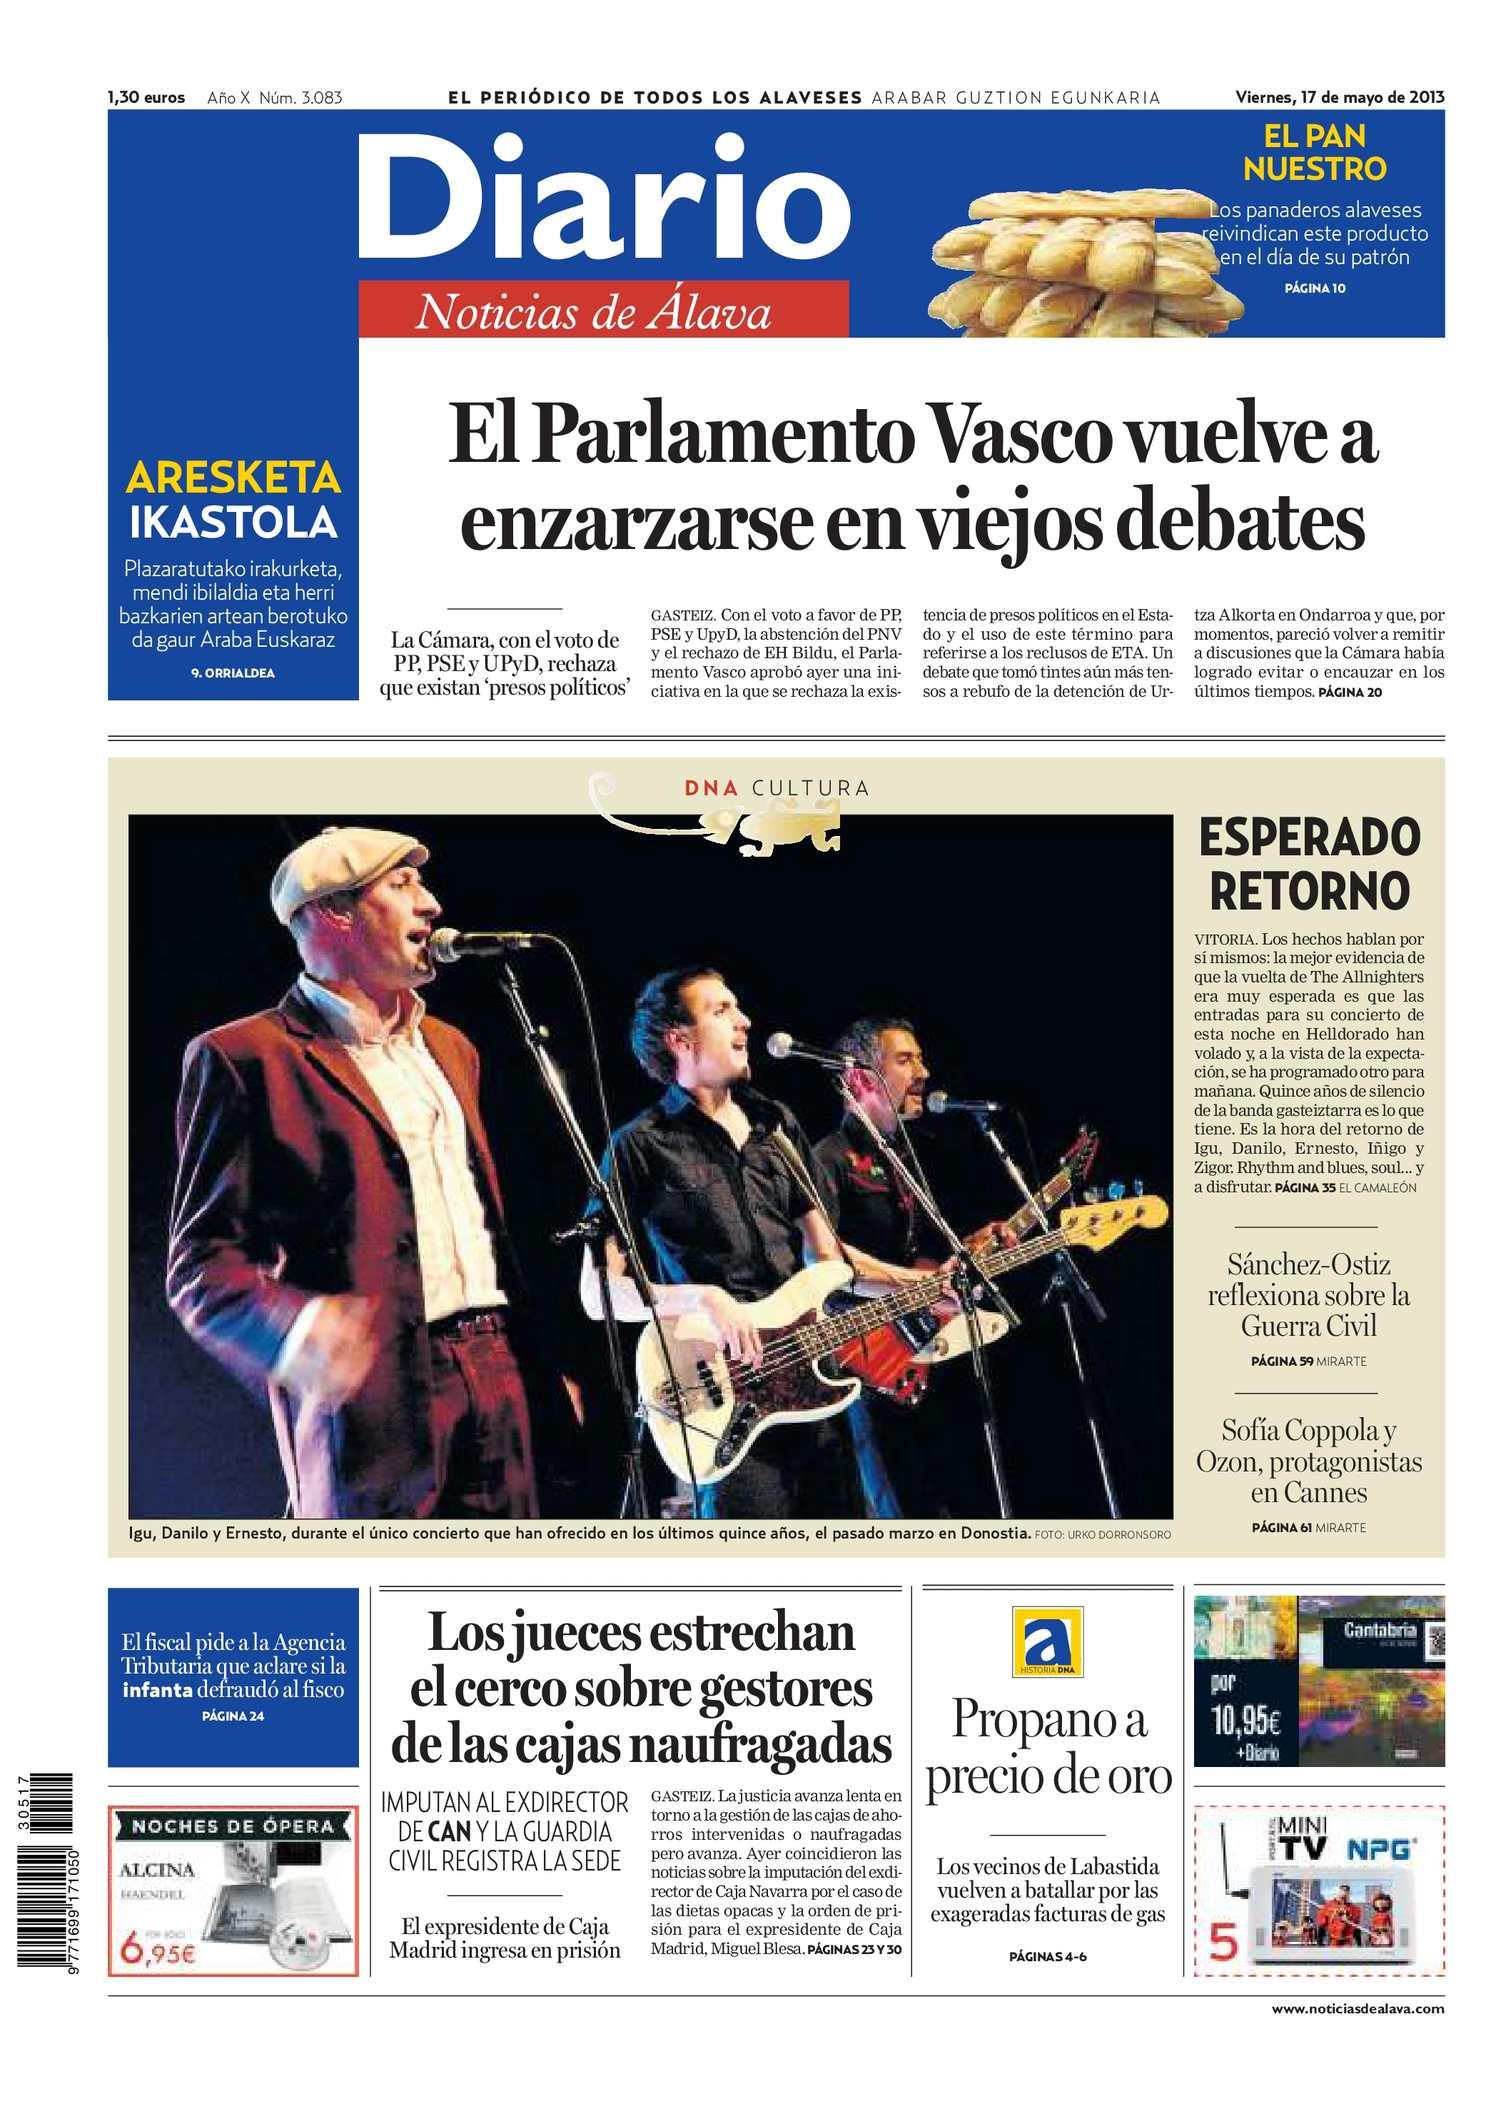 Araceli Playa Porno Iputas calaméo - diario de noticias de Álava 20130517